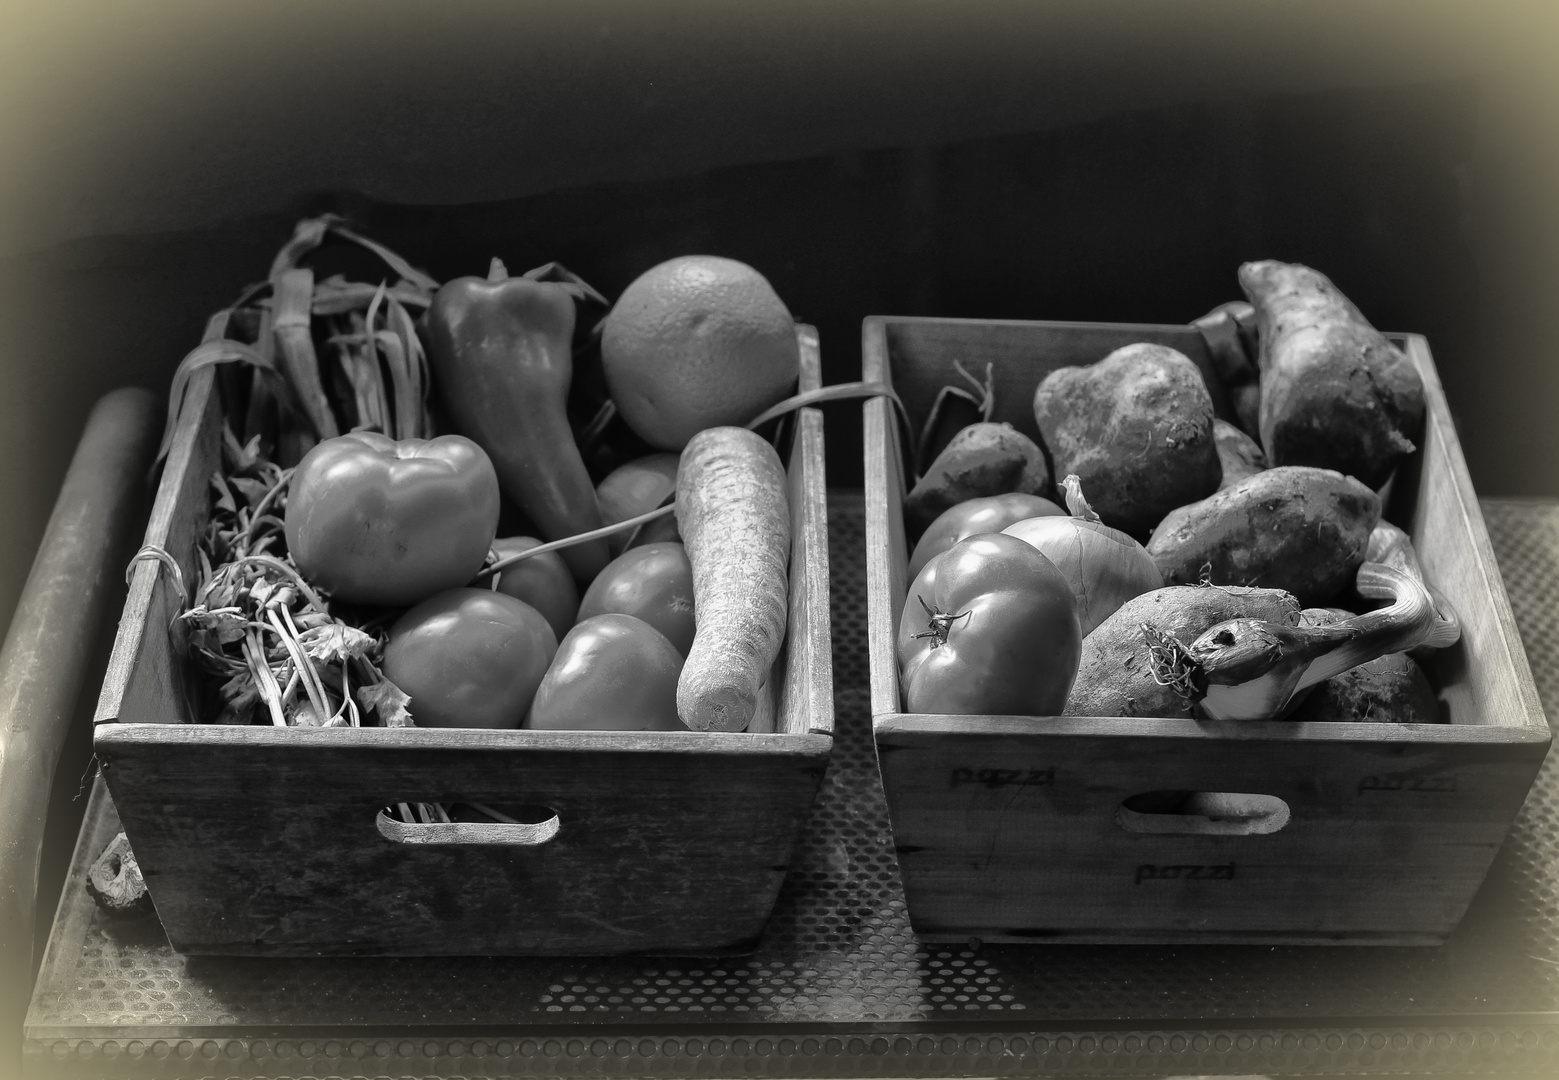 Los cajones de verdura